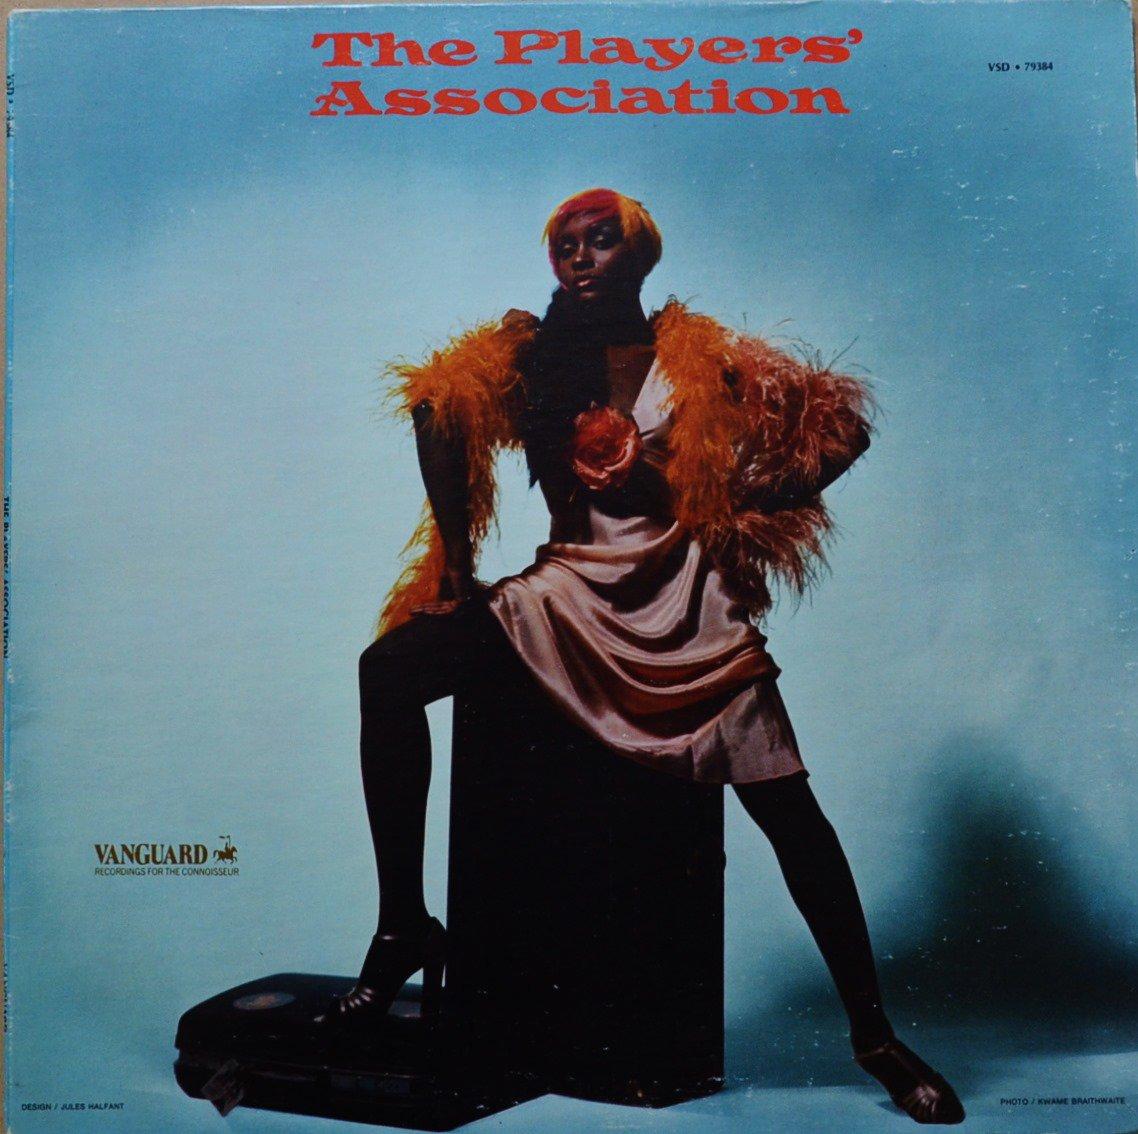 THE PLAYERS' ASSOCIATION / THE PLAYERS' ASSOCIATION (LP)